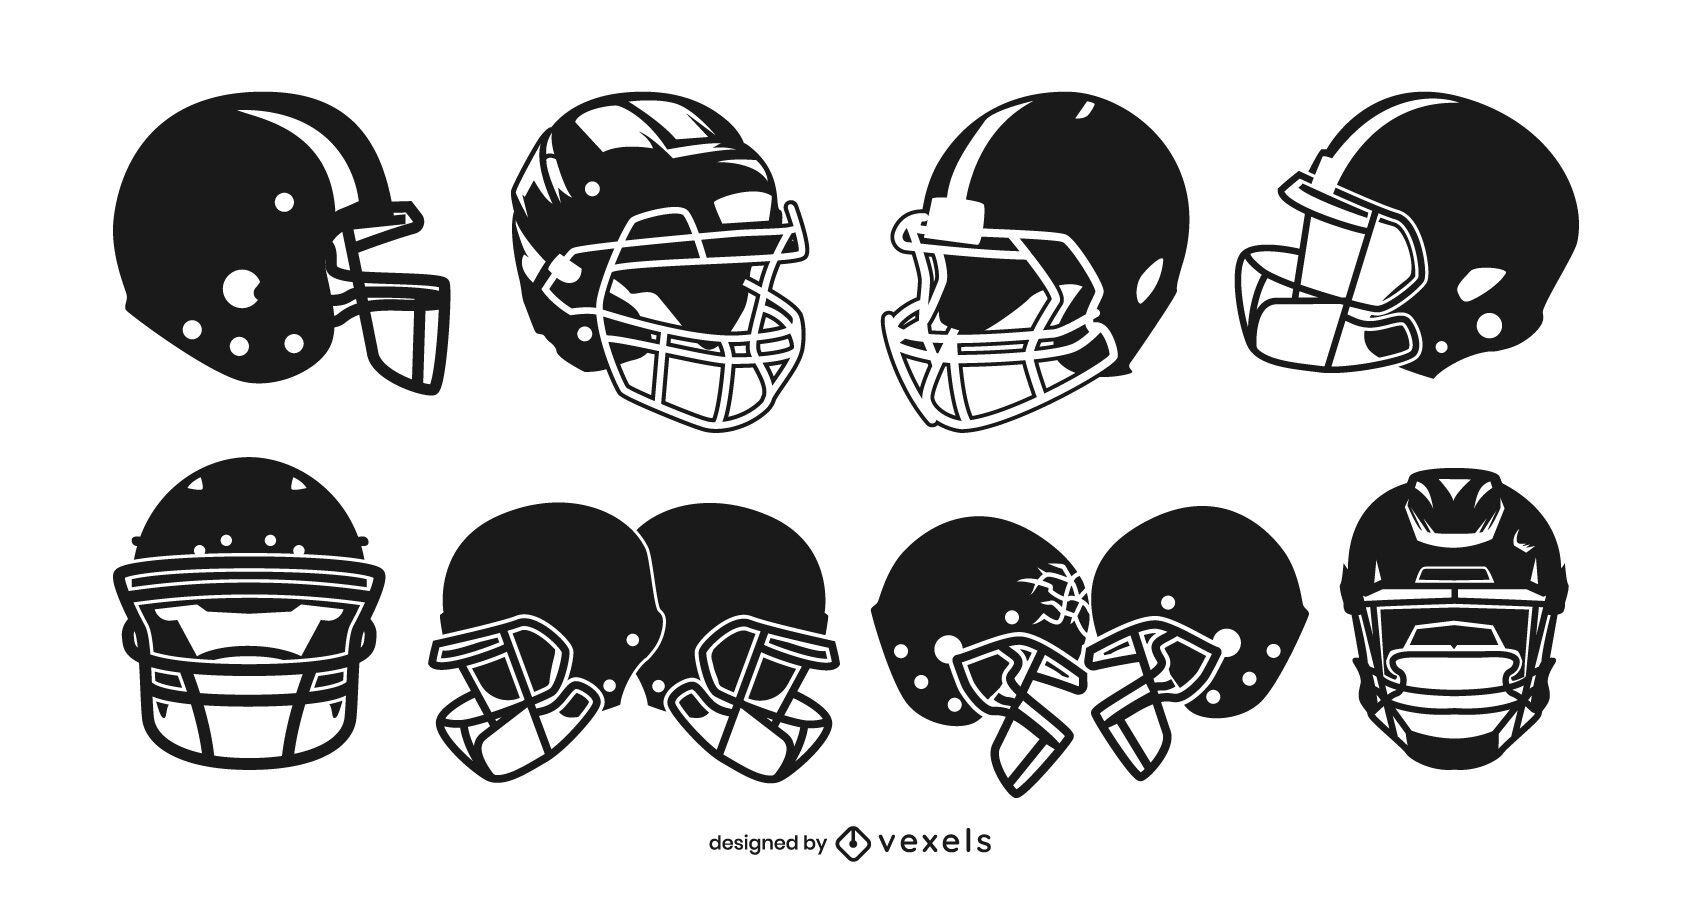 Conjunto de diseño de casco de fútbol